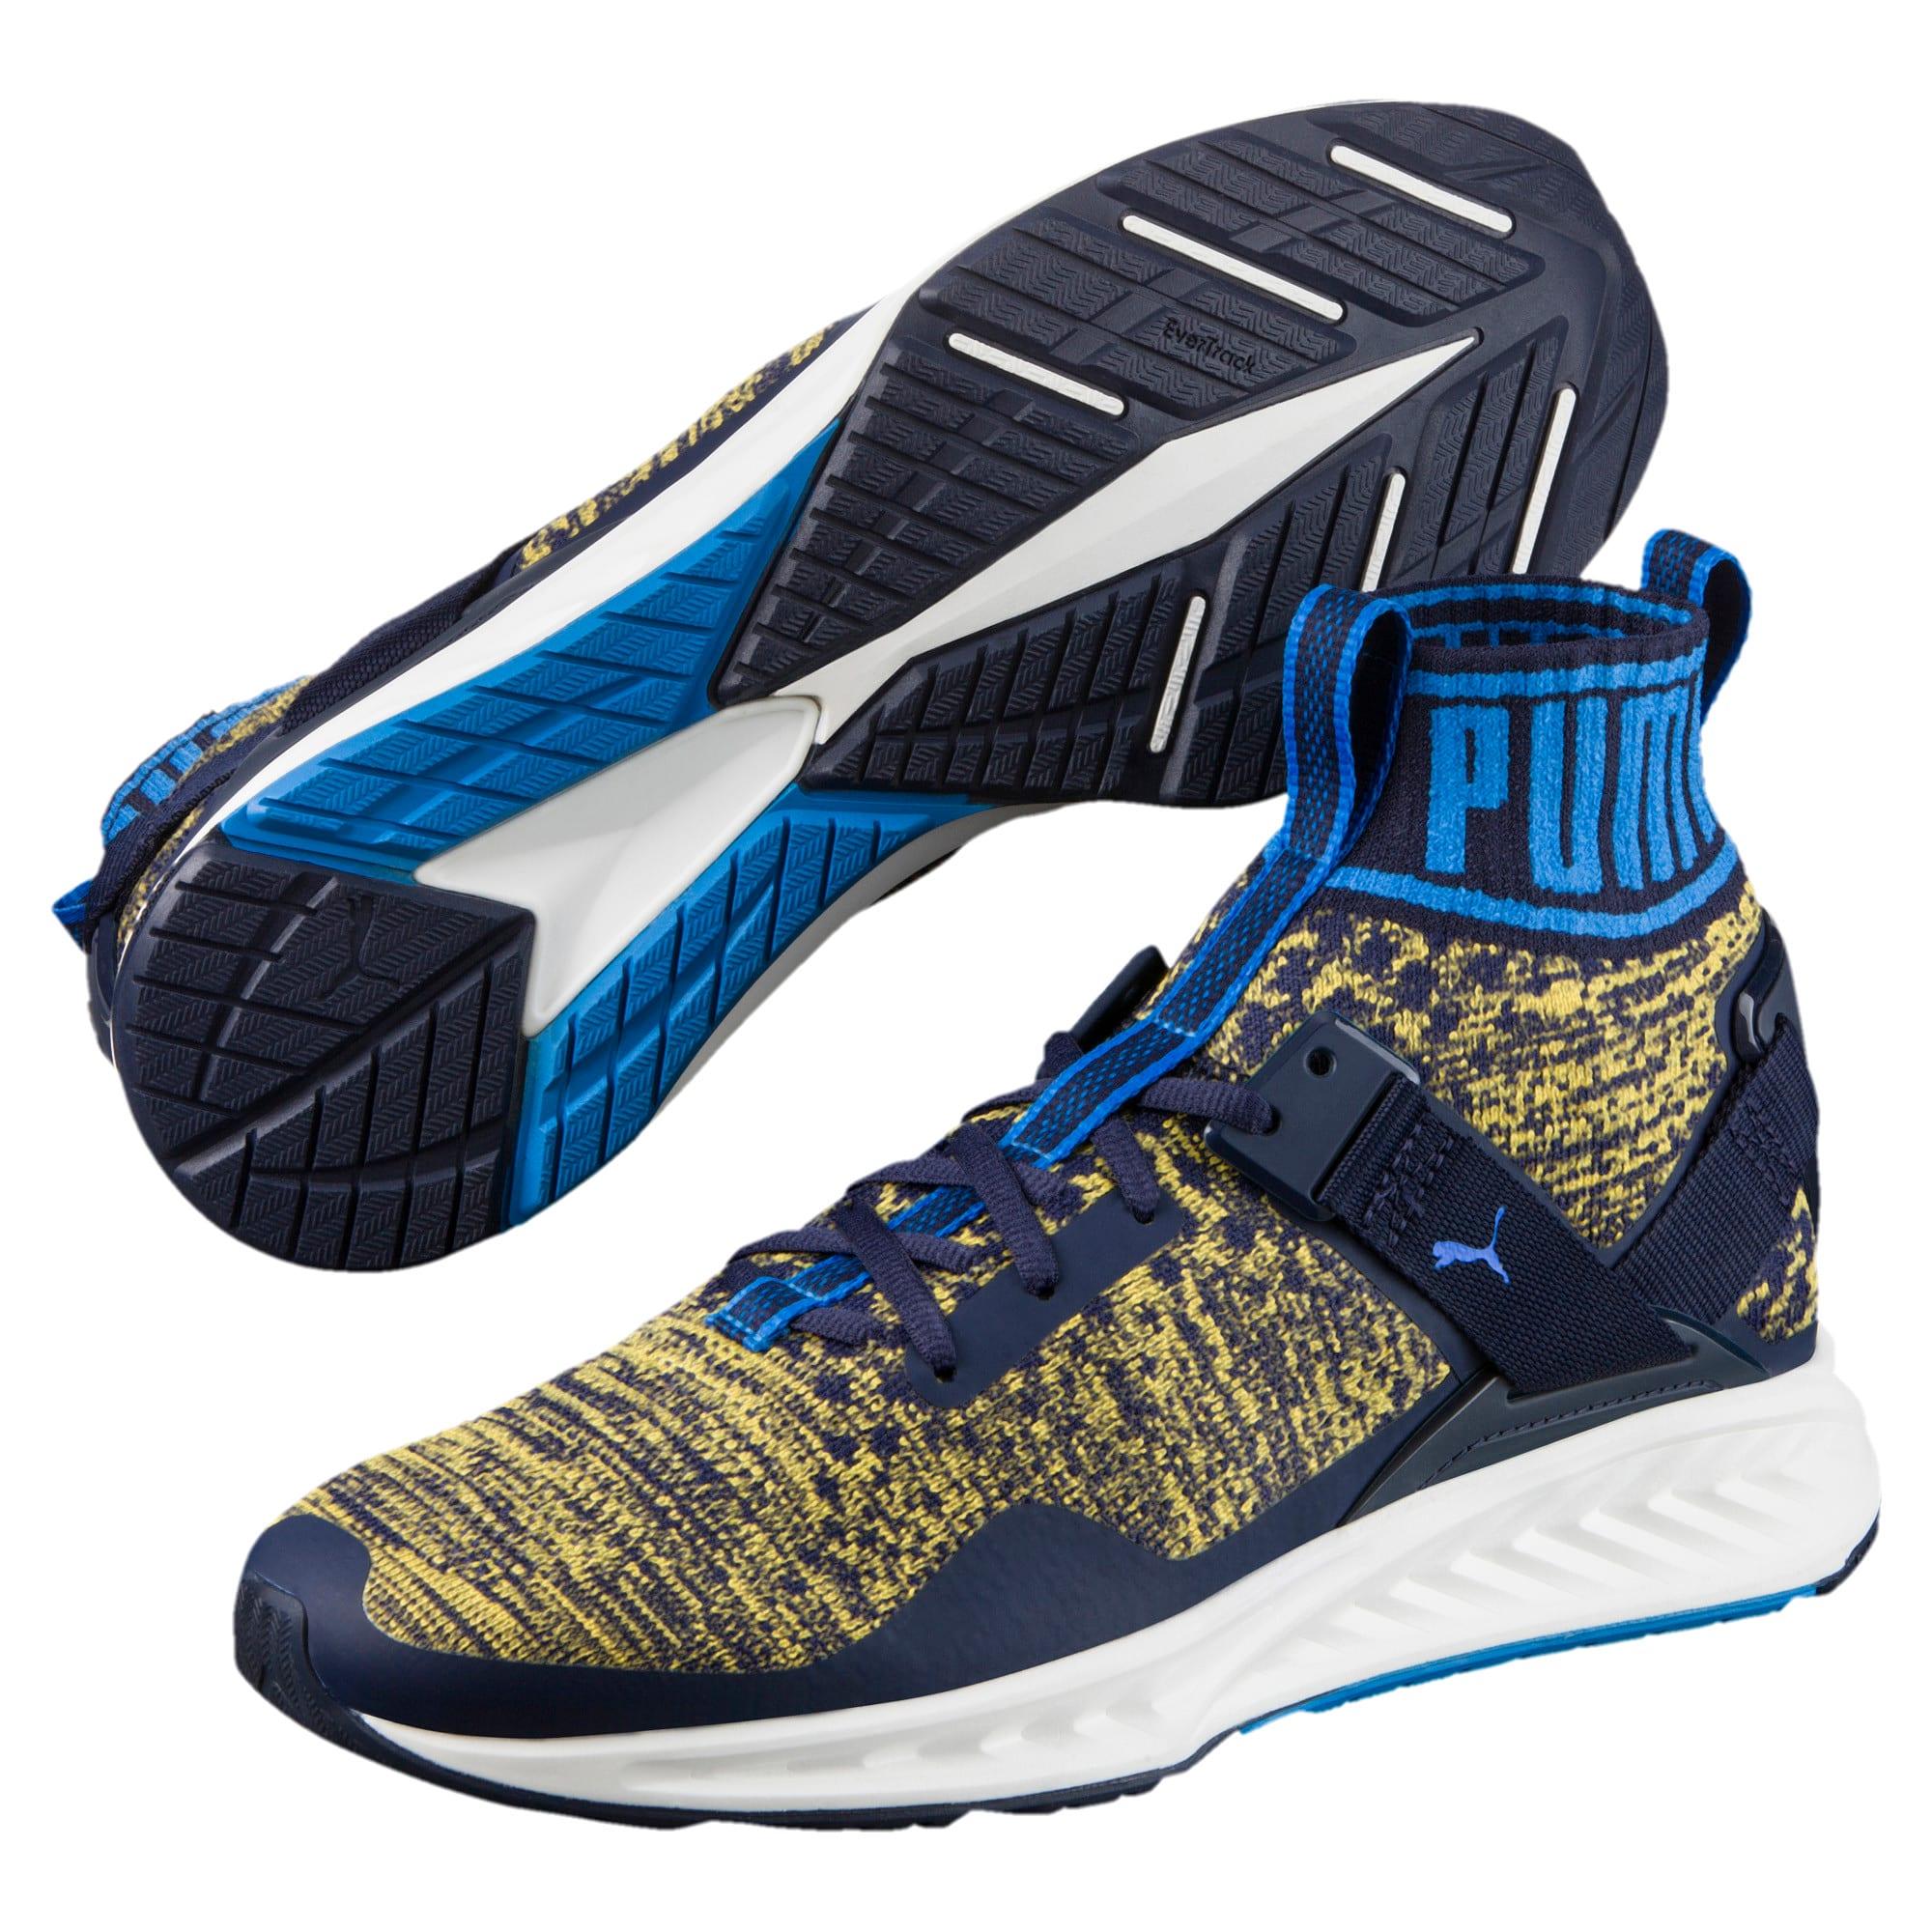 new product 0f774 156e3 IGNITE evoKNIT Men's Training Shoes